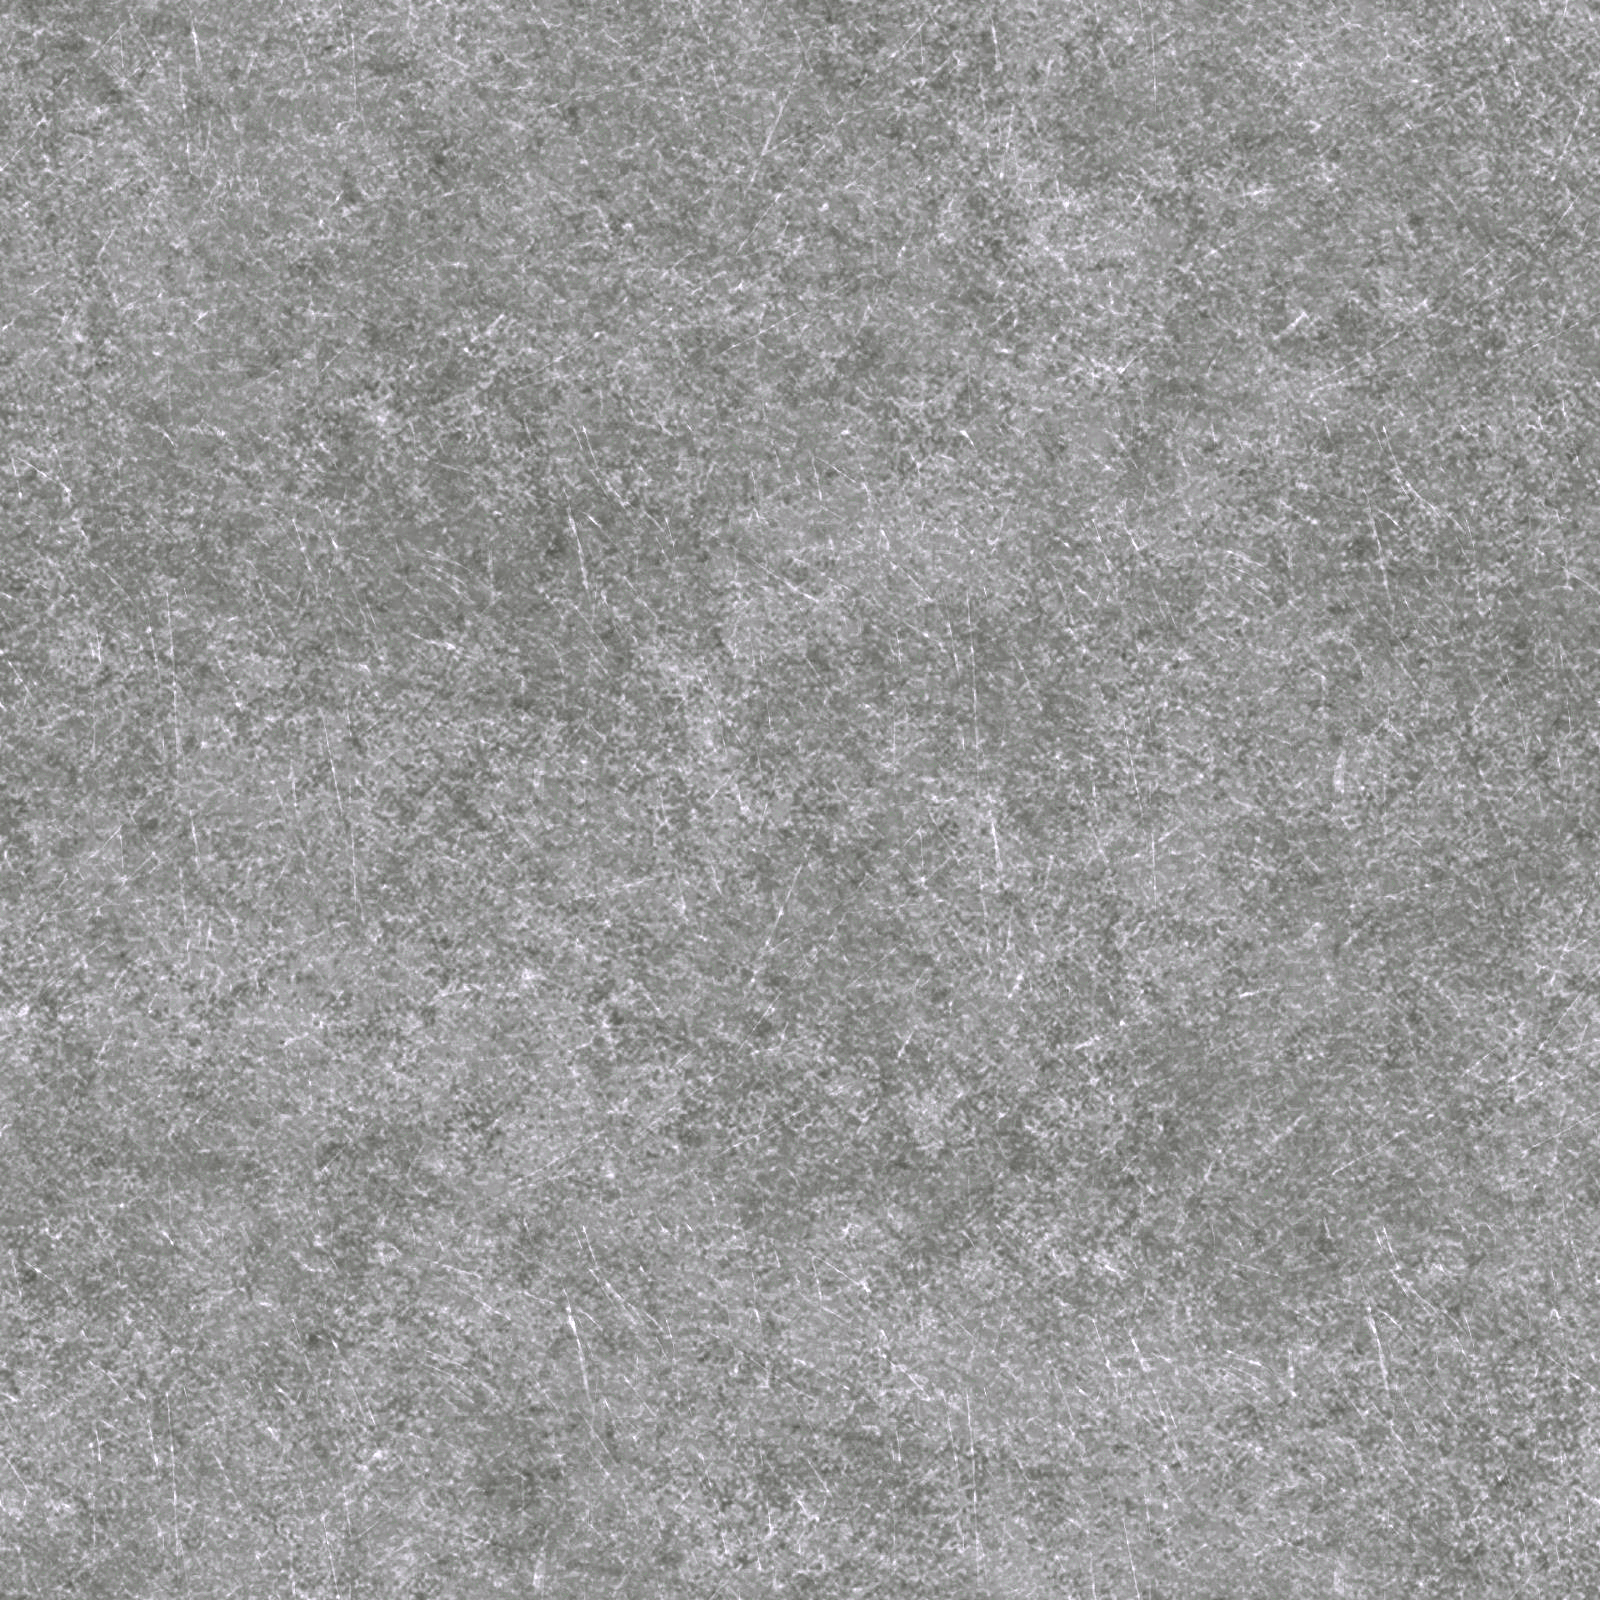 [Resim: textures_v1_77b3q2g.jpg]